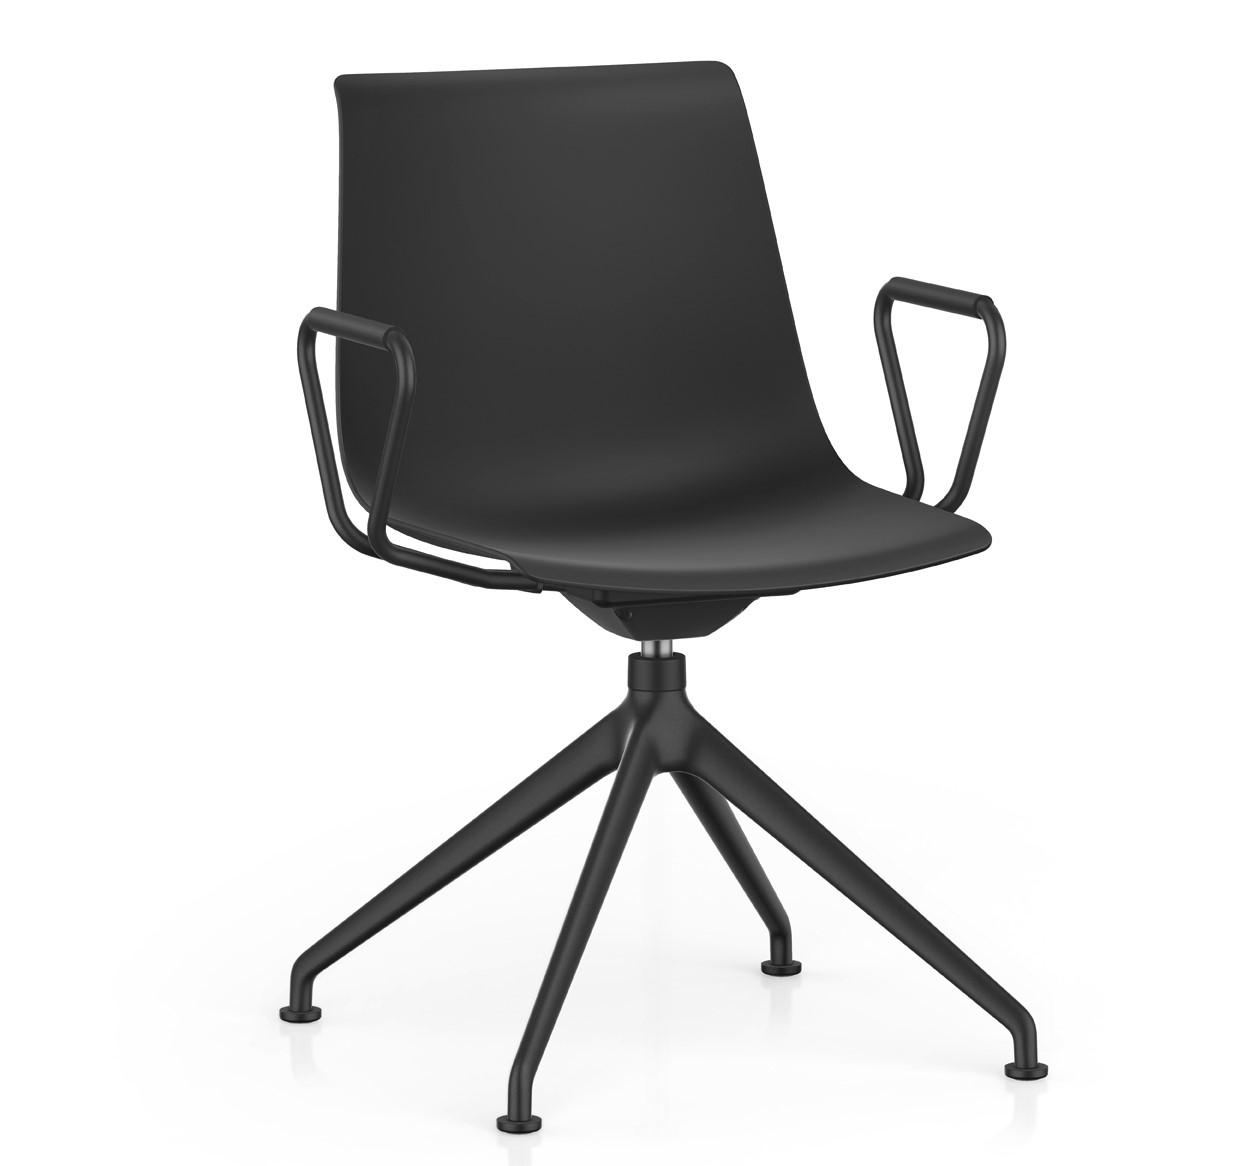 SHUFFLEis1 SU141_S1 stoel